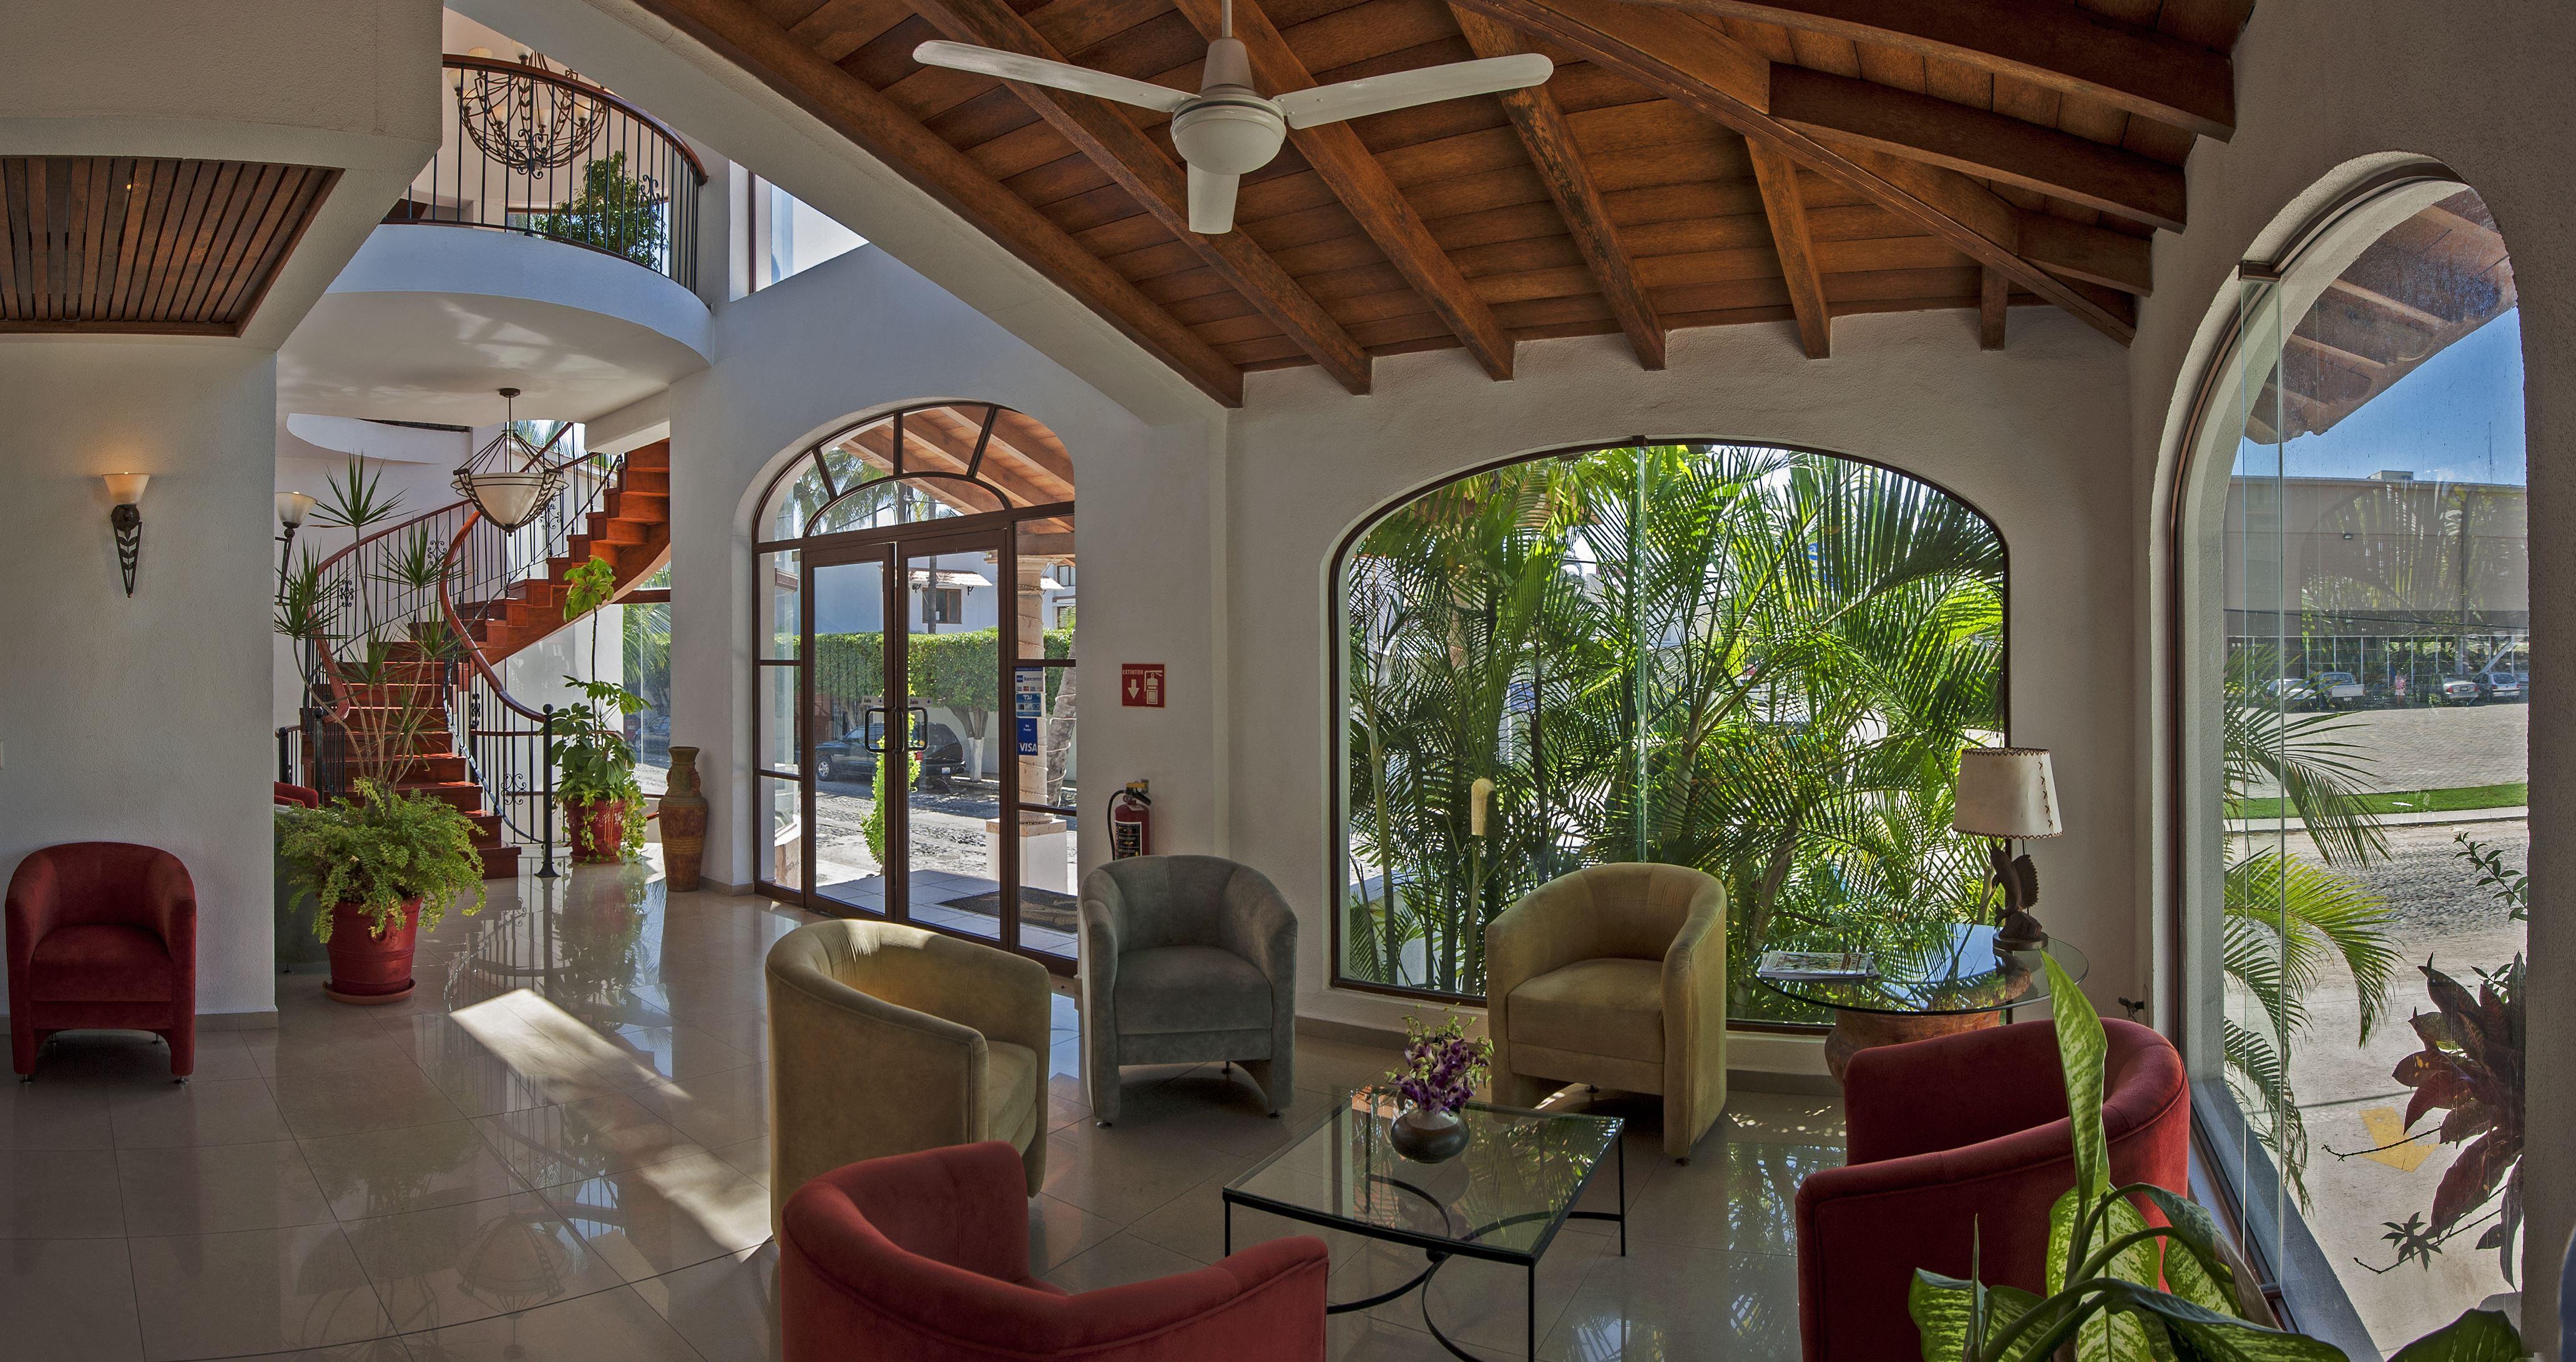 Hotel Ejecutivo Pez Vela